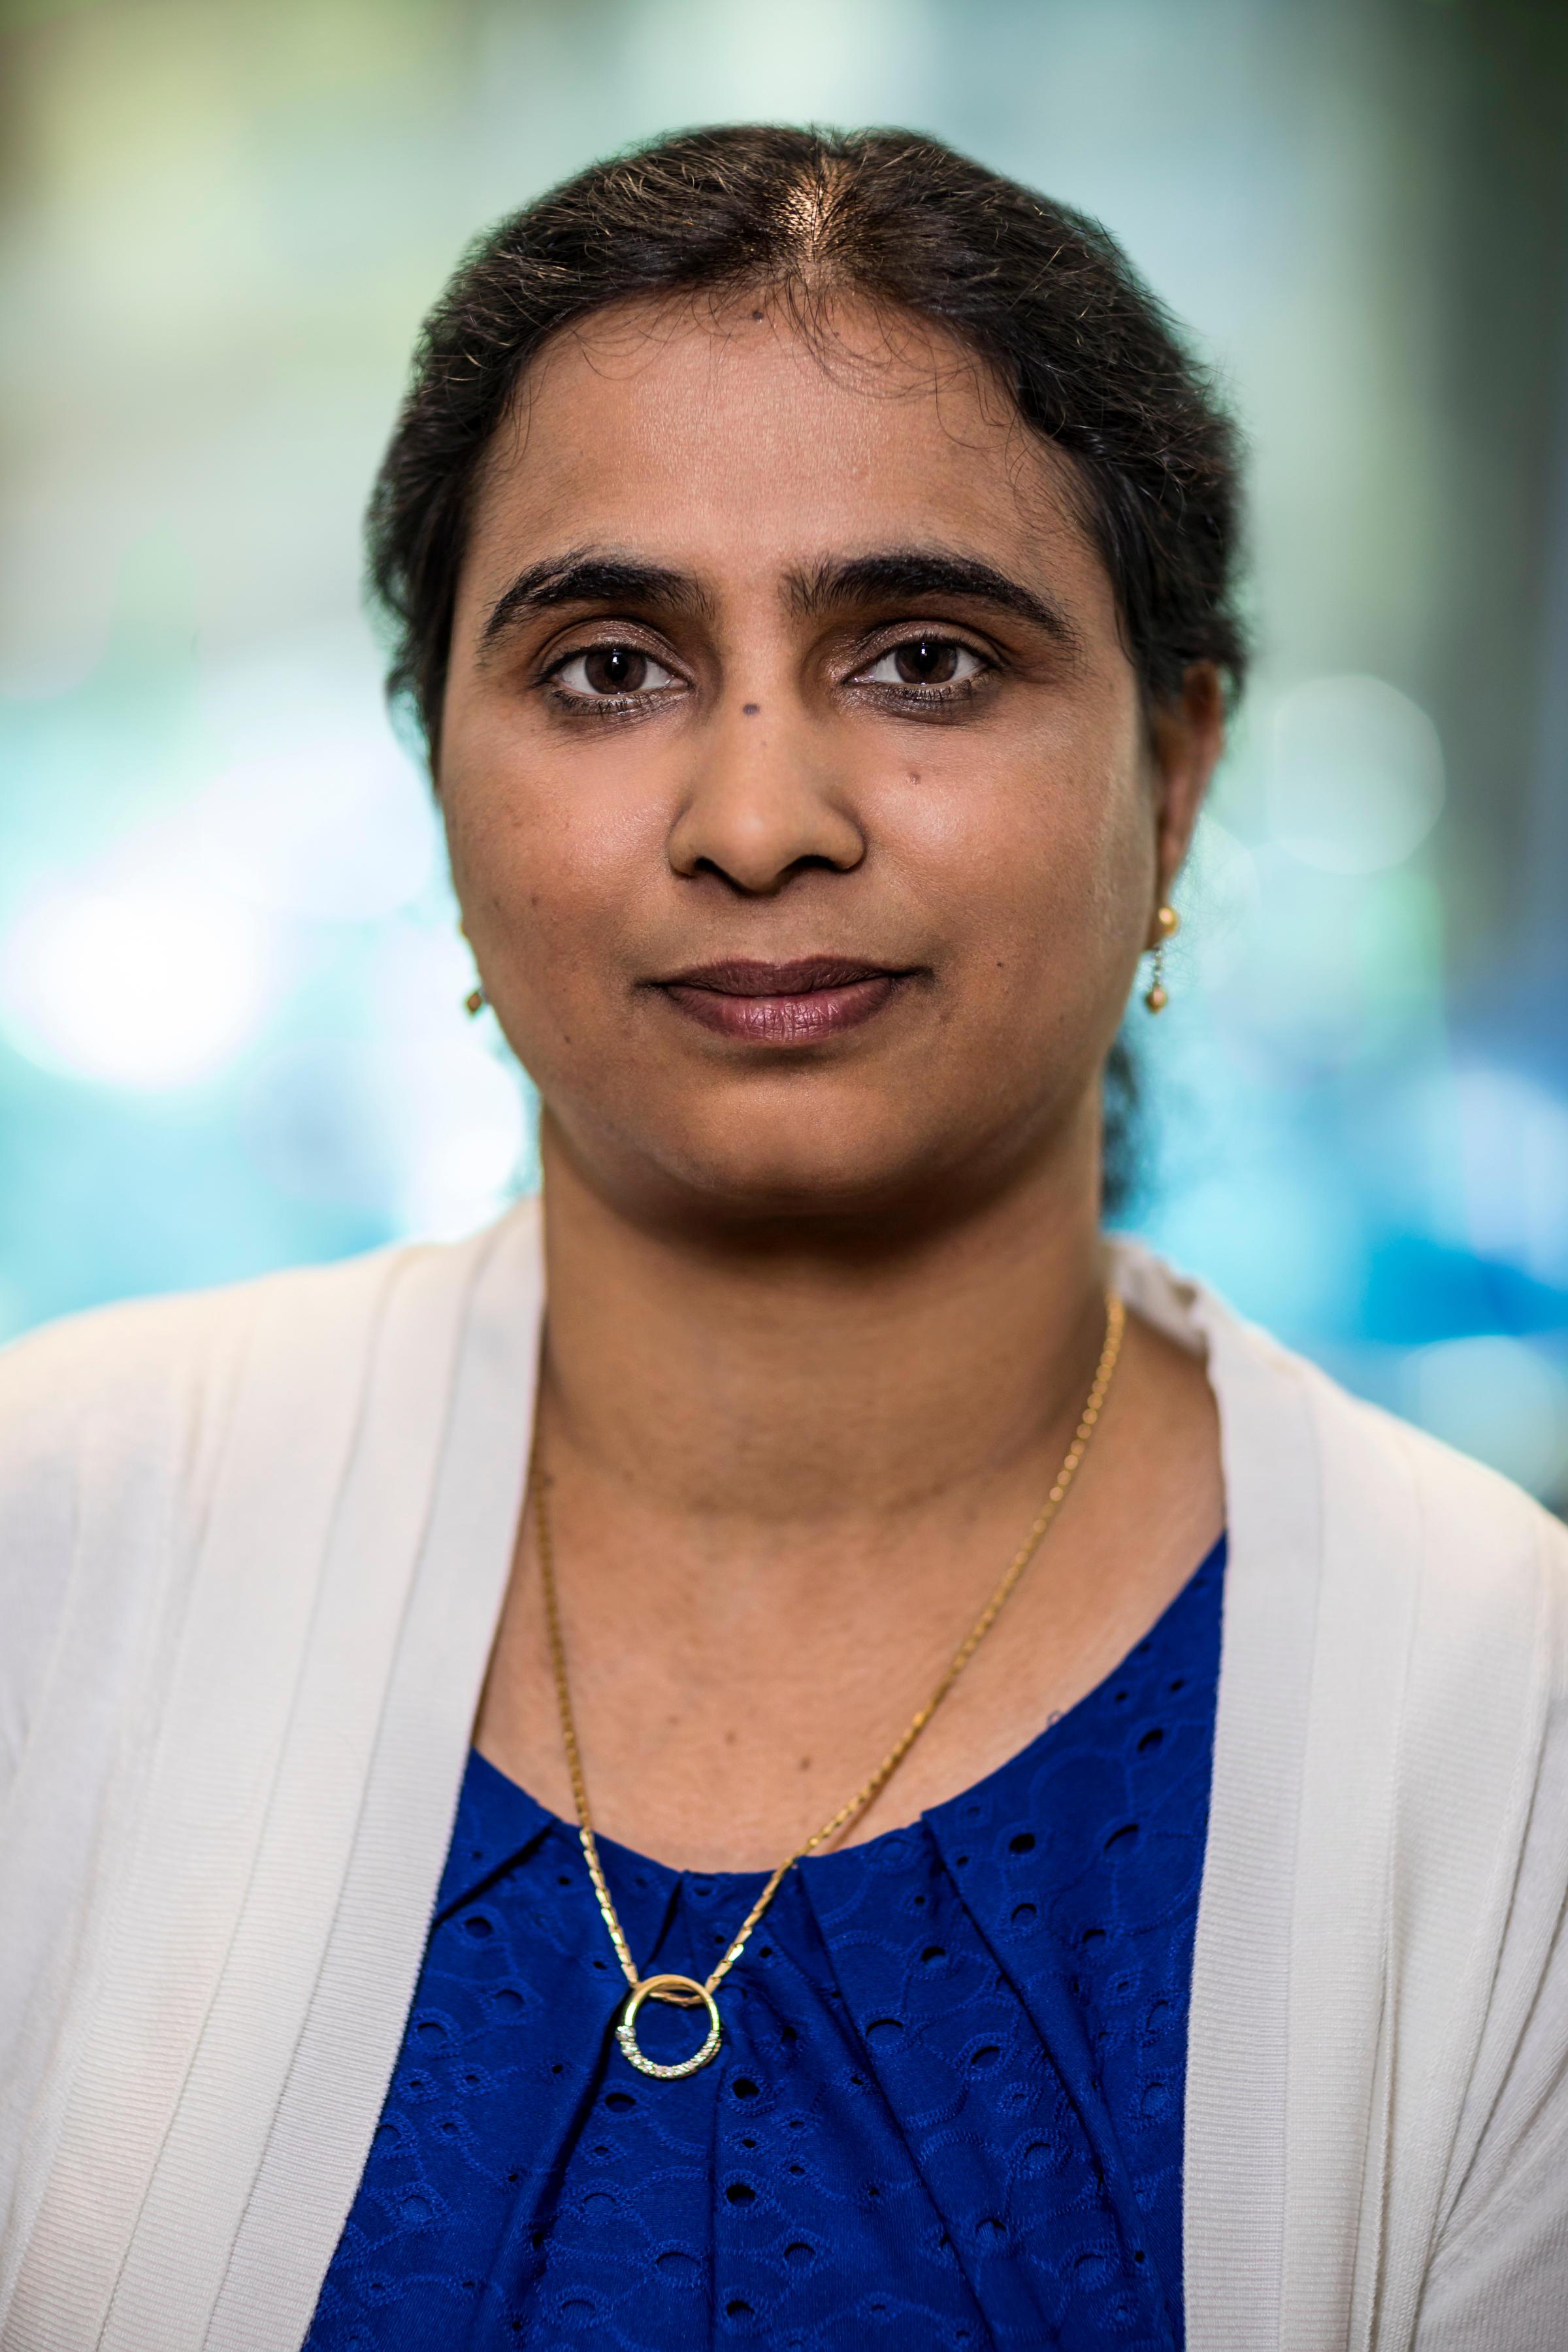 Madhavi Annavajjula, MD Internal Medicine